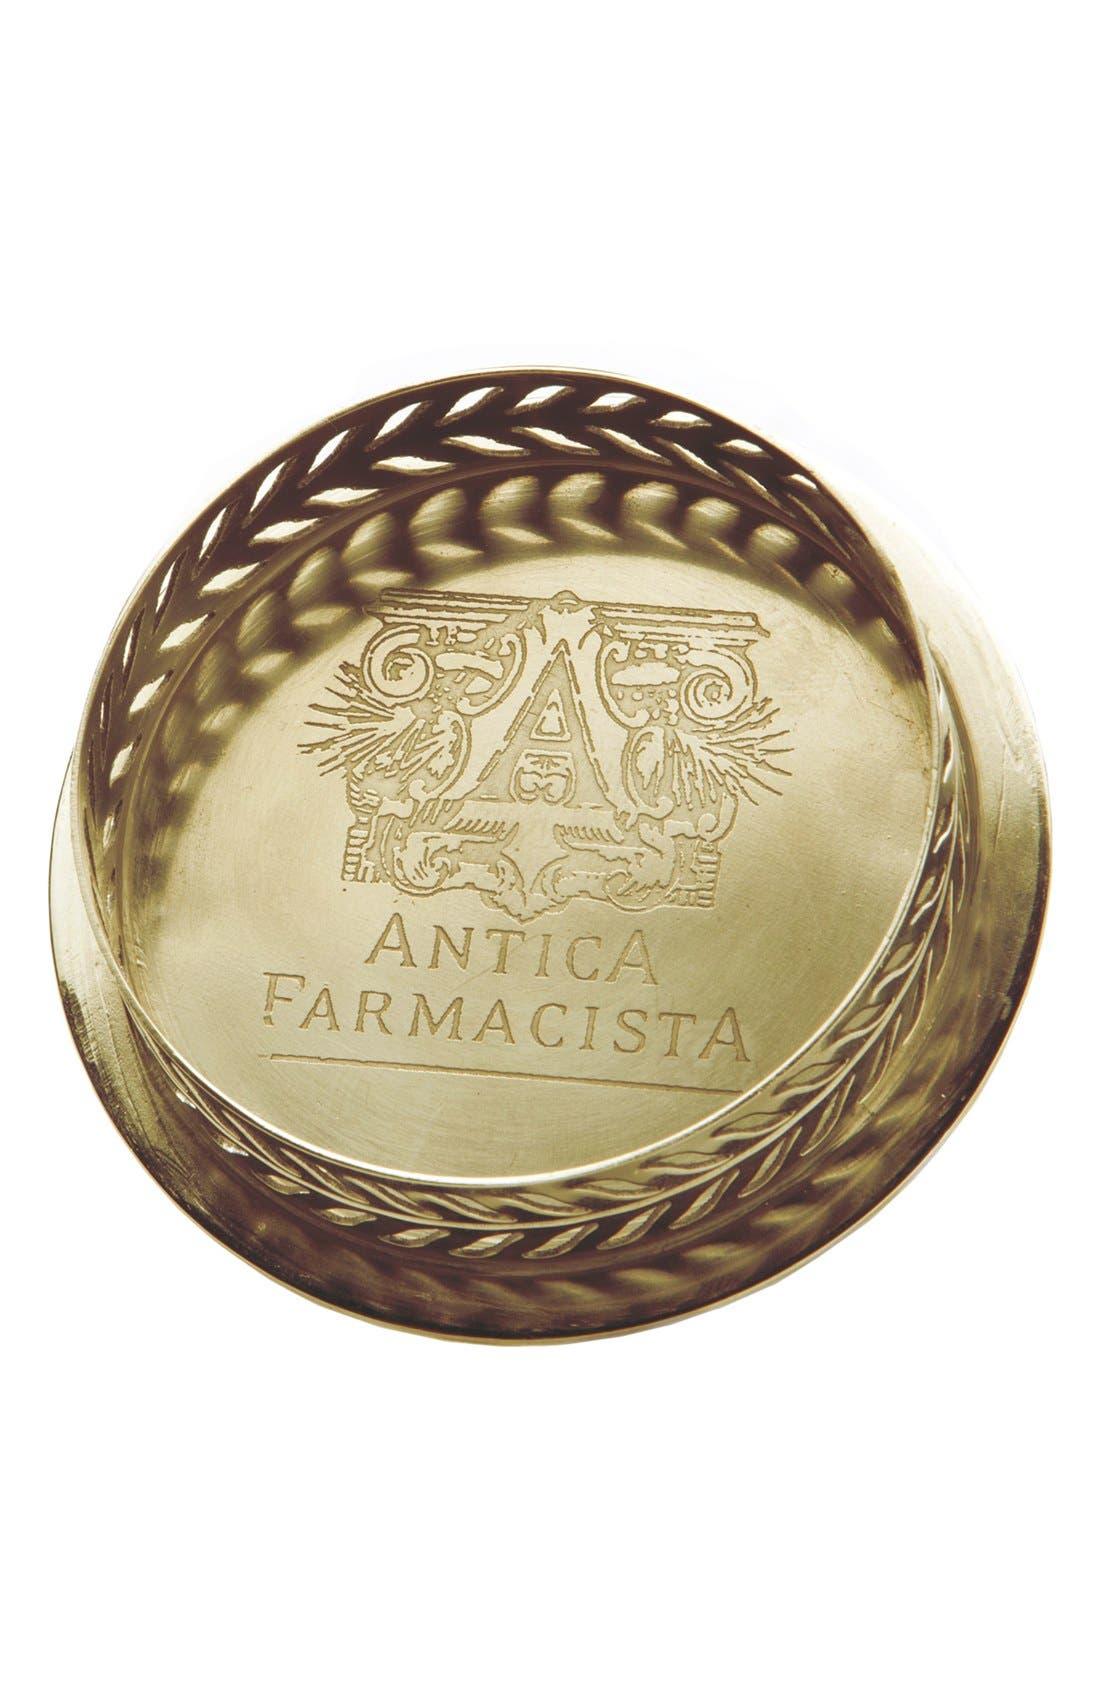 Main Image - Antica Farmacista Brass Home Ambiance Diffuser Tray (8.5 oz.)